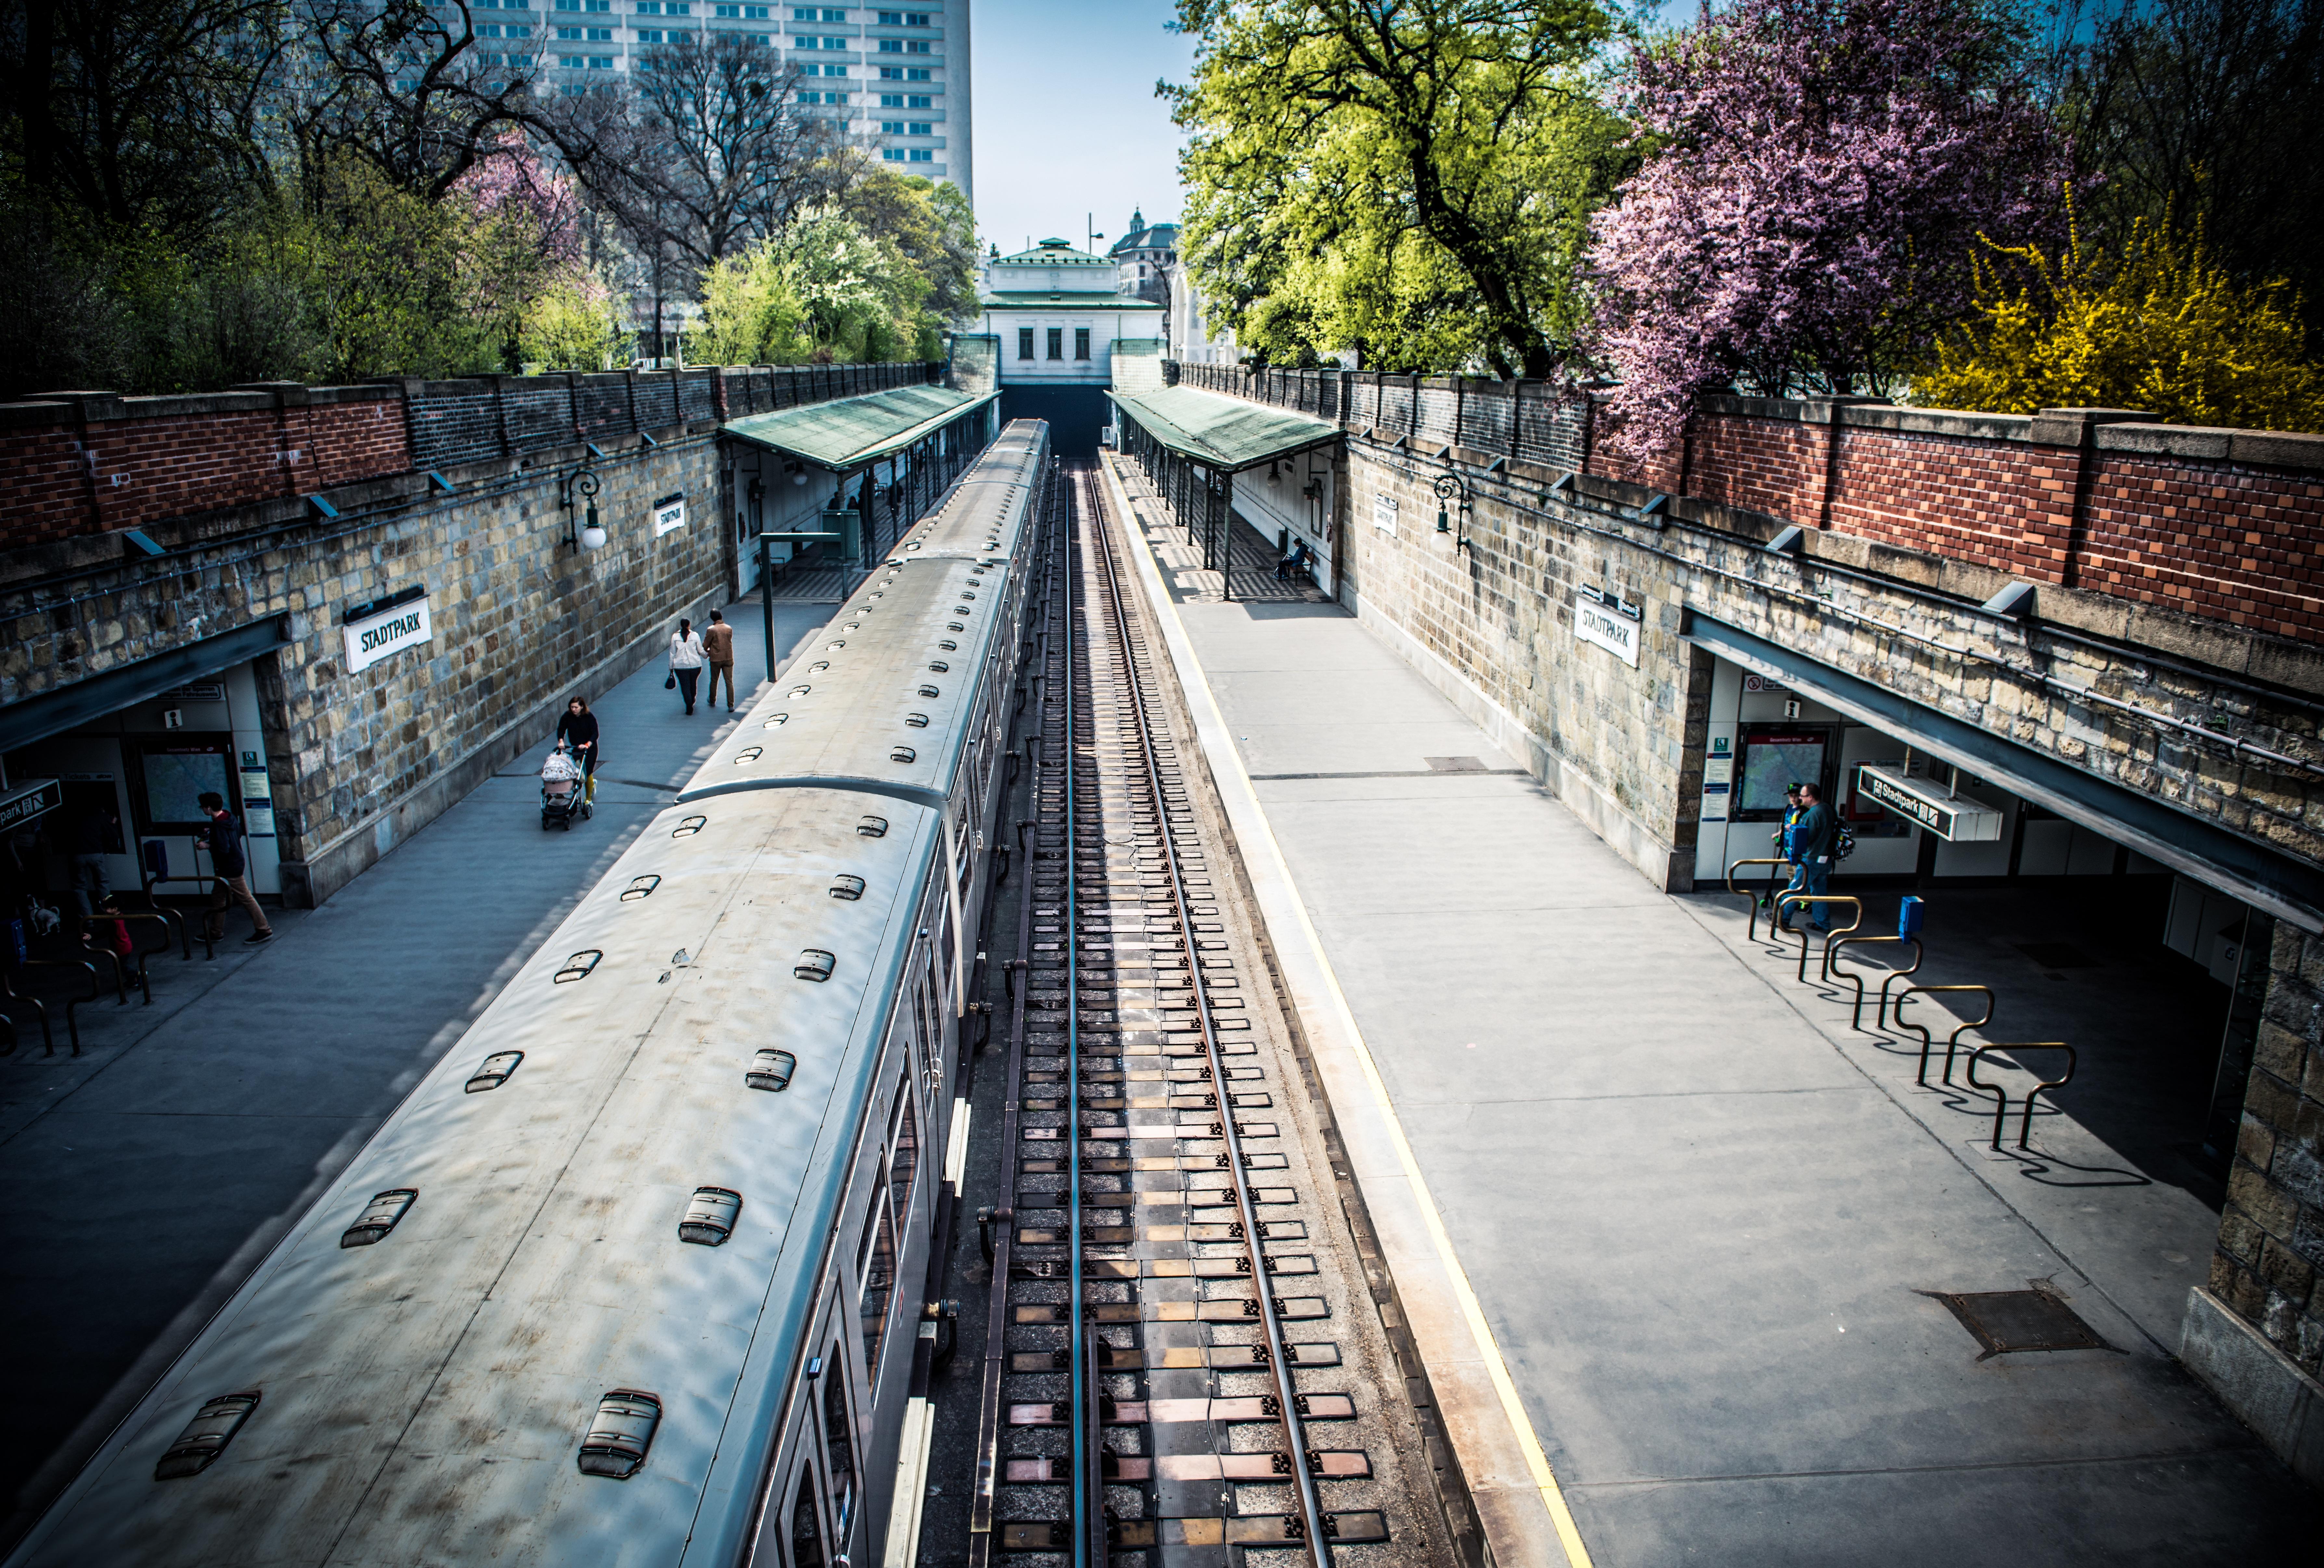 Platform, Transport, Train, Track, Rail, HQ Photo